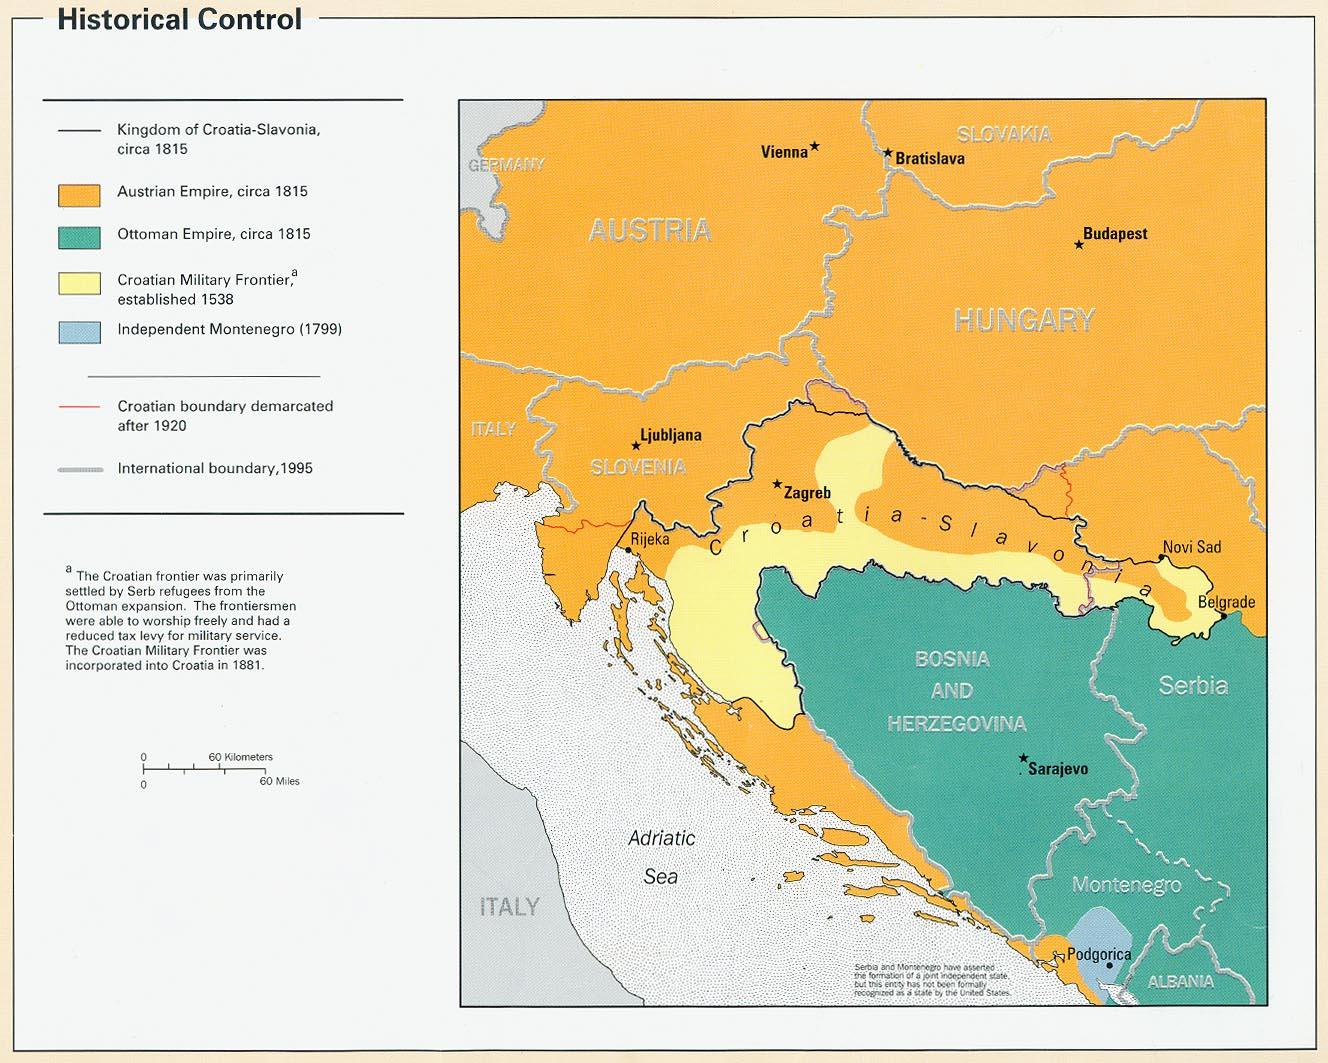 Mapa del Control Histórico de Croacia